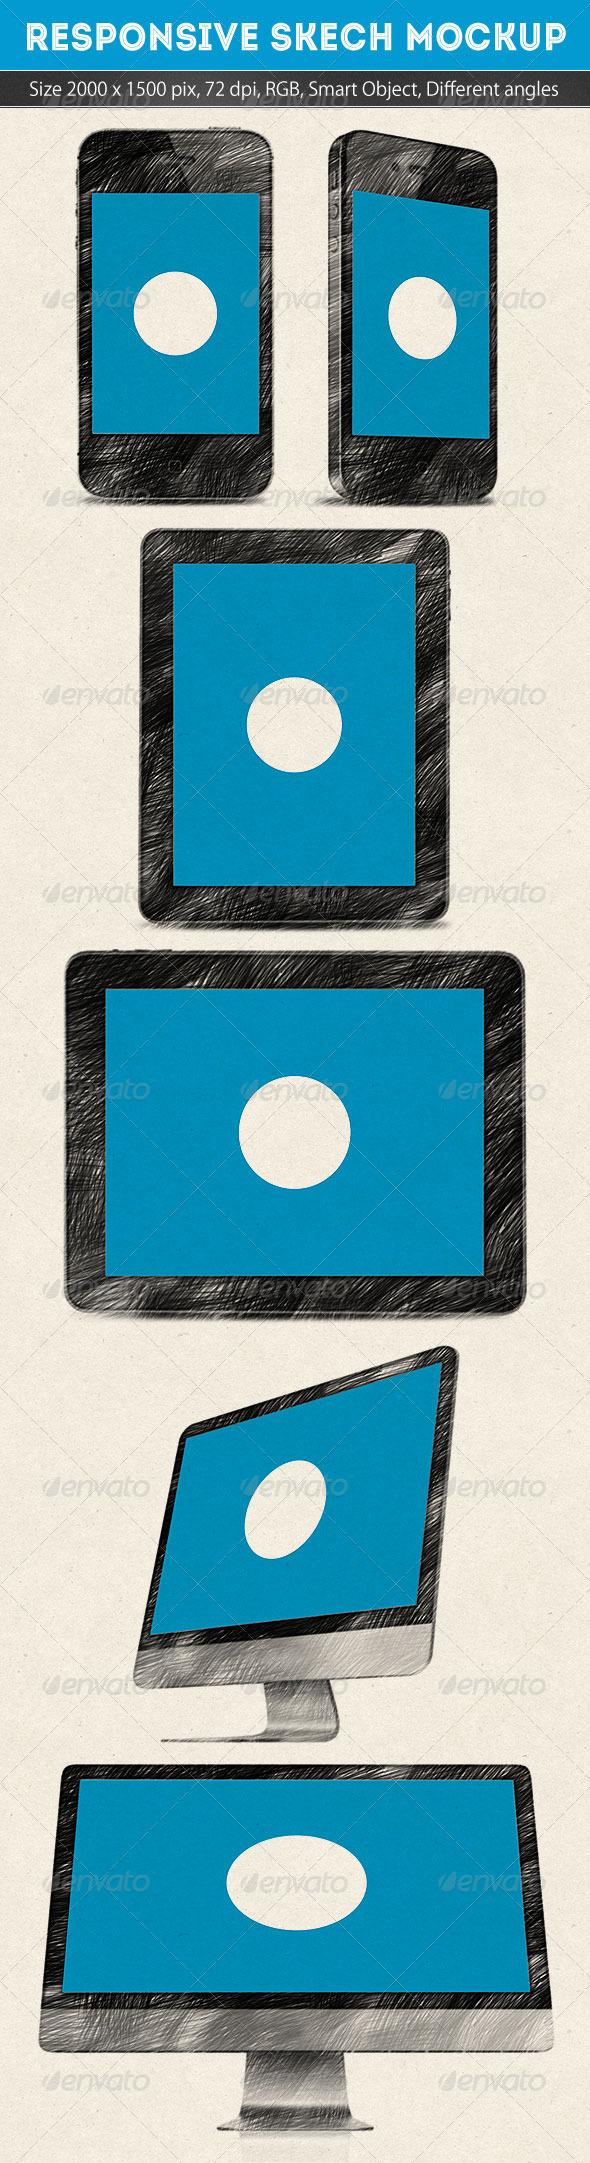 GraphicRiver Responsive Skech Mockup 5310471